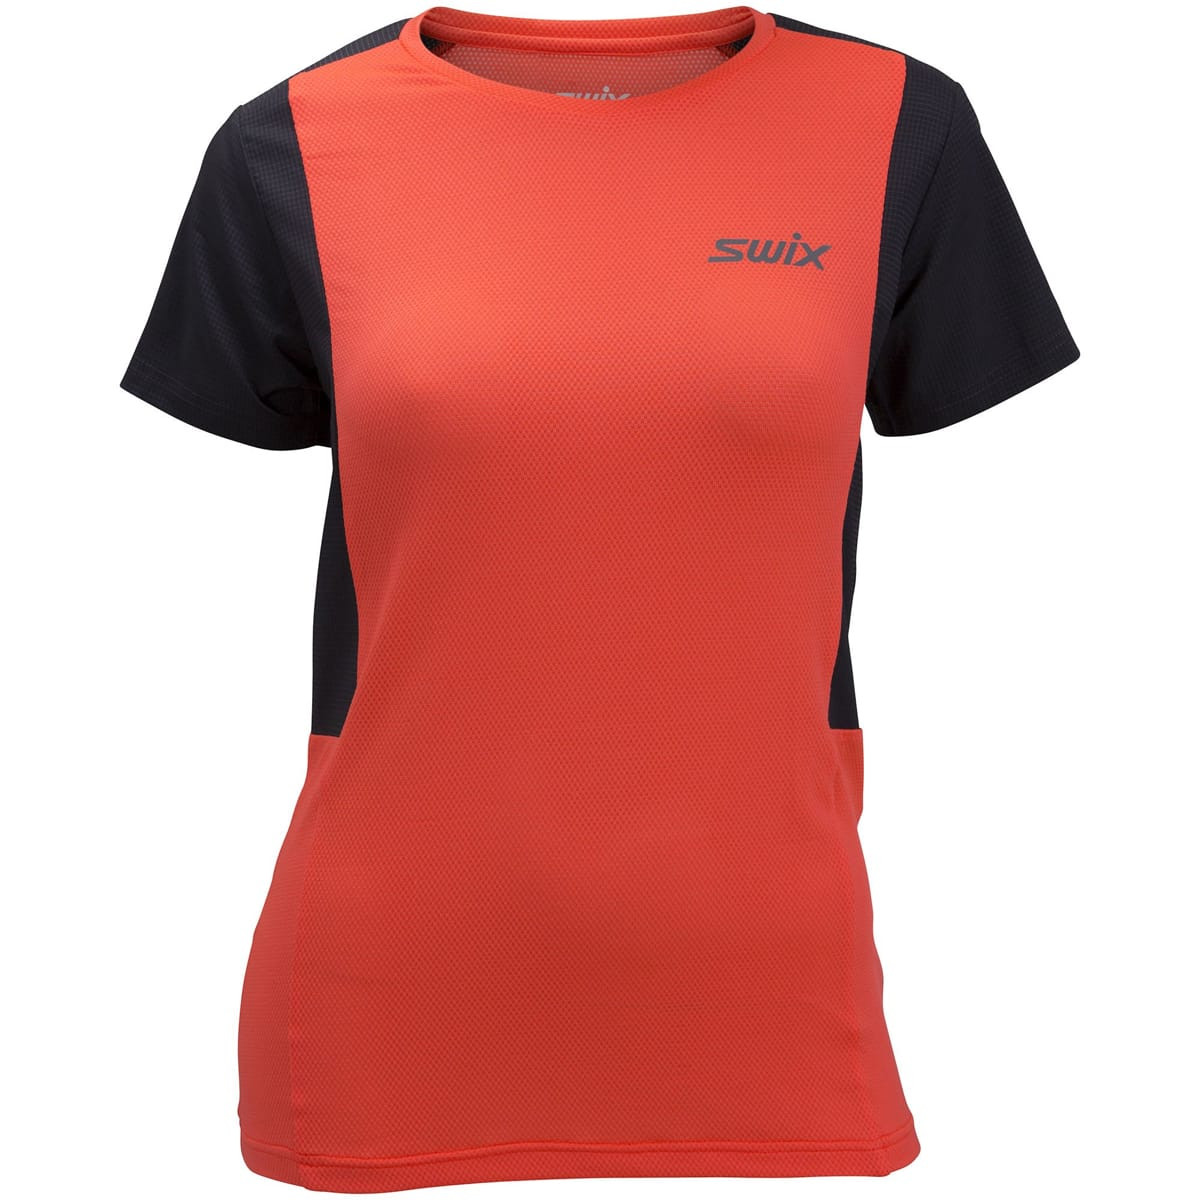 dc384c41 Swix Radiant Performance T-Shirt Women Neon Red | Supersport.no